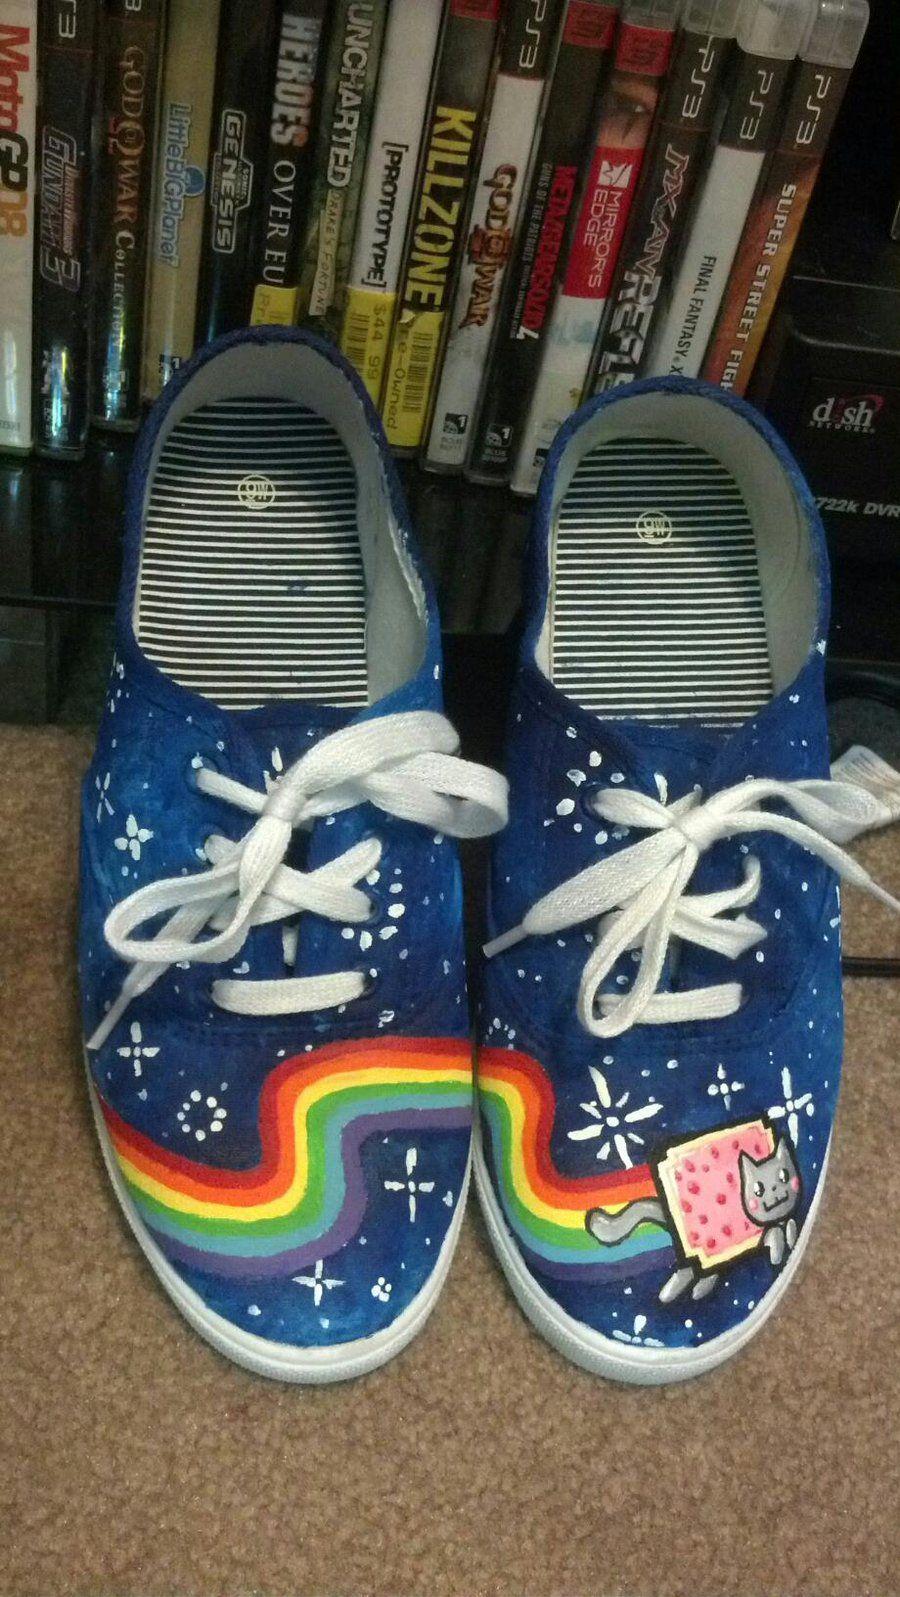 47b69cb2b1c53 Nyan cat shoes!!!!!!!!! | Cover My Footsies! | Cat shoes, Nyan cat ...